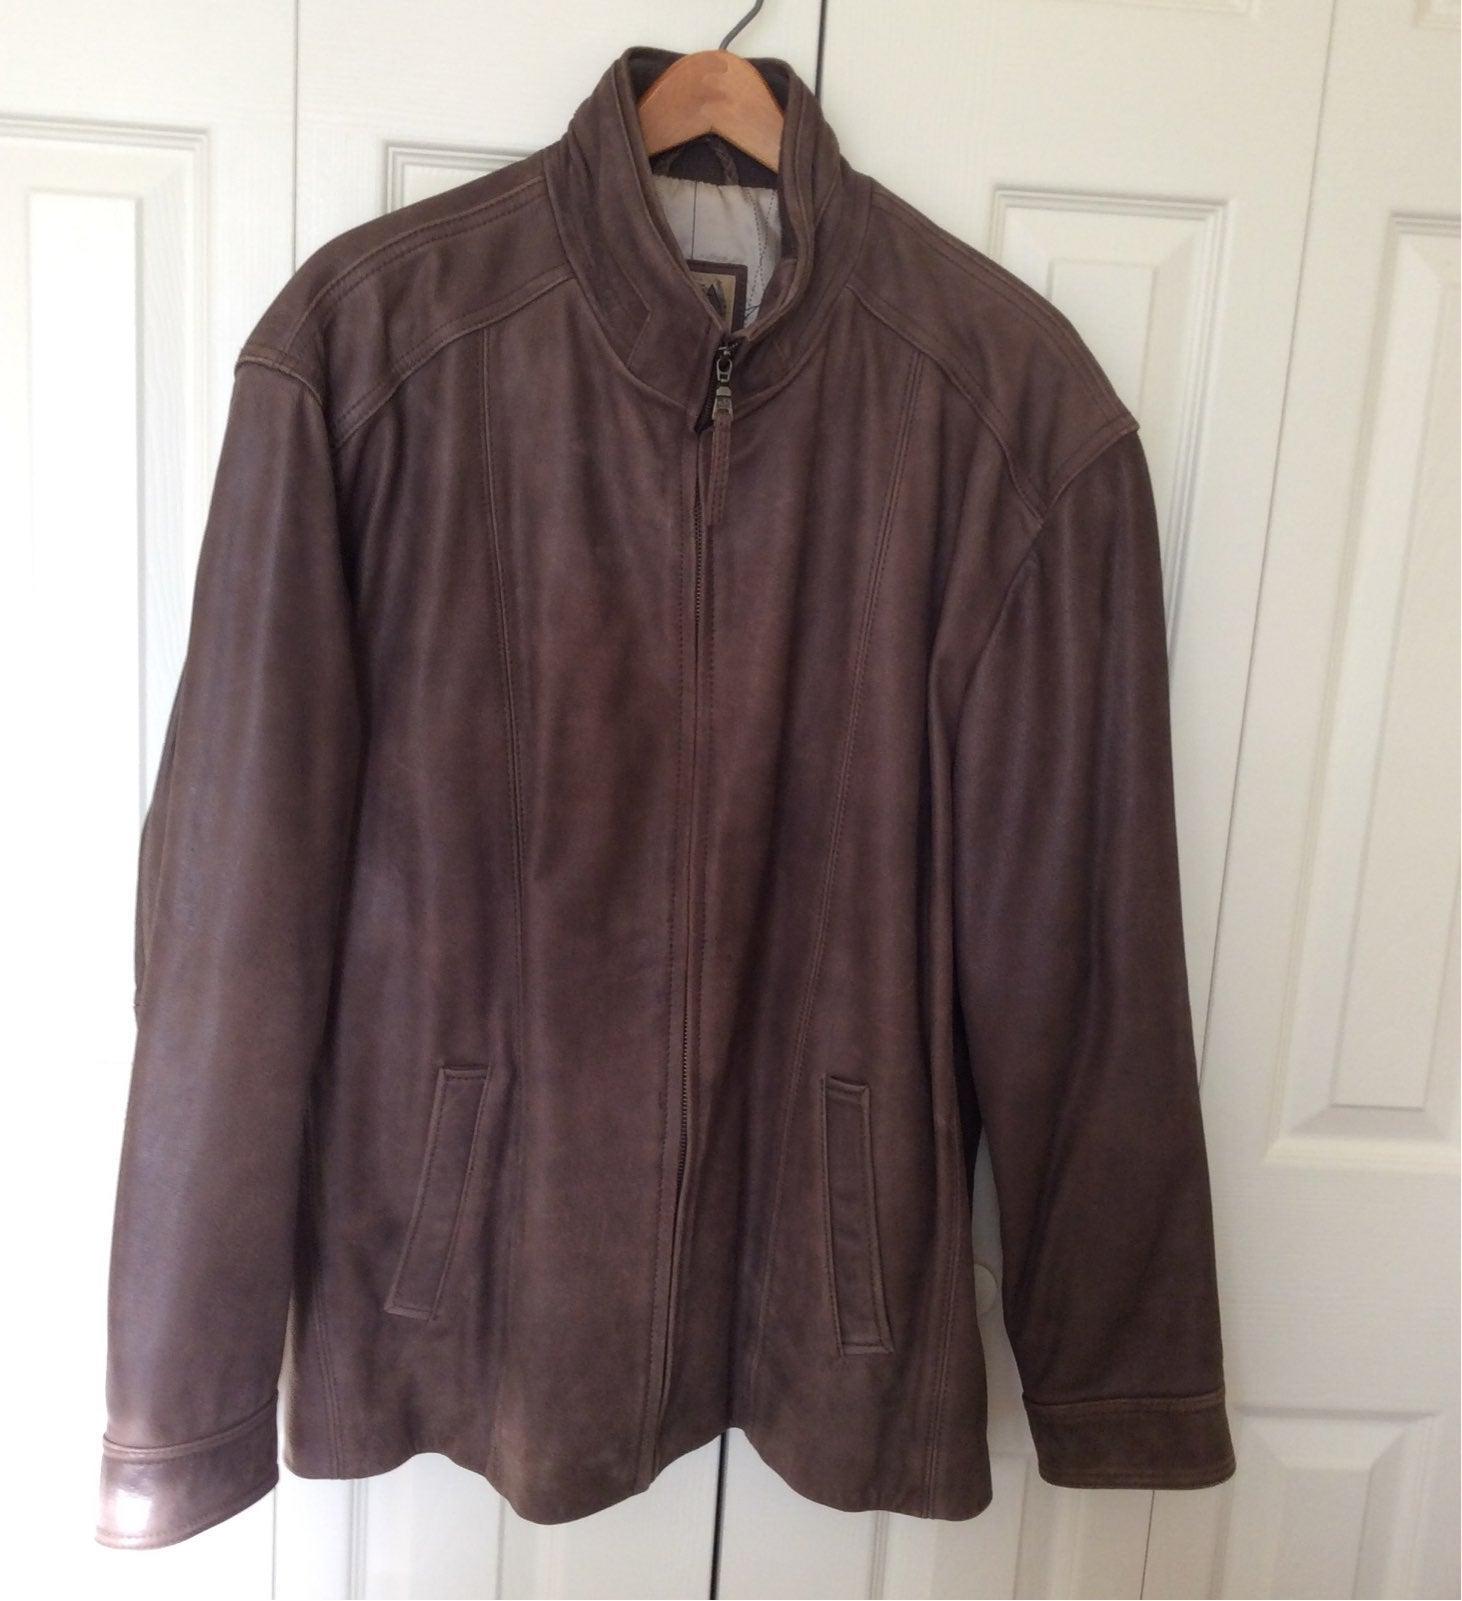 Mens XXL JoABanks Brown Leather Jacket